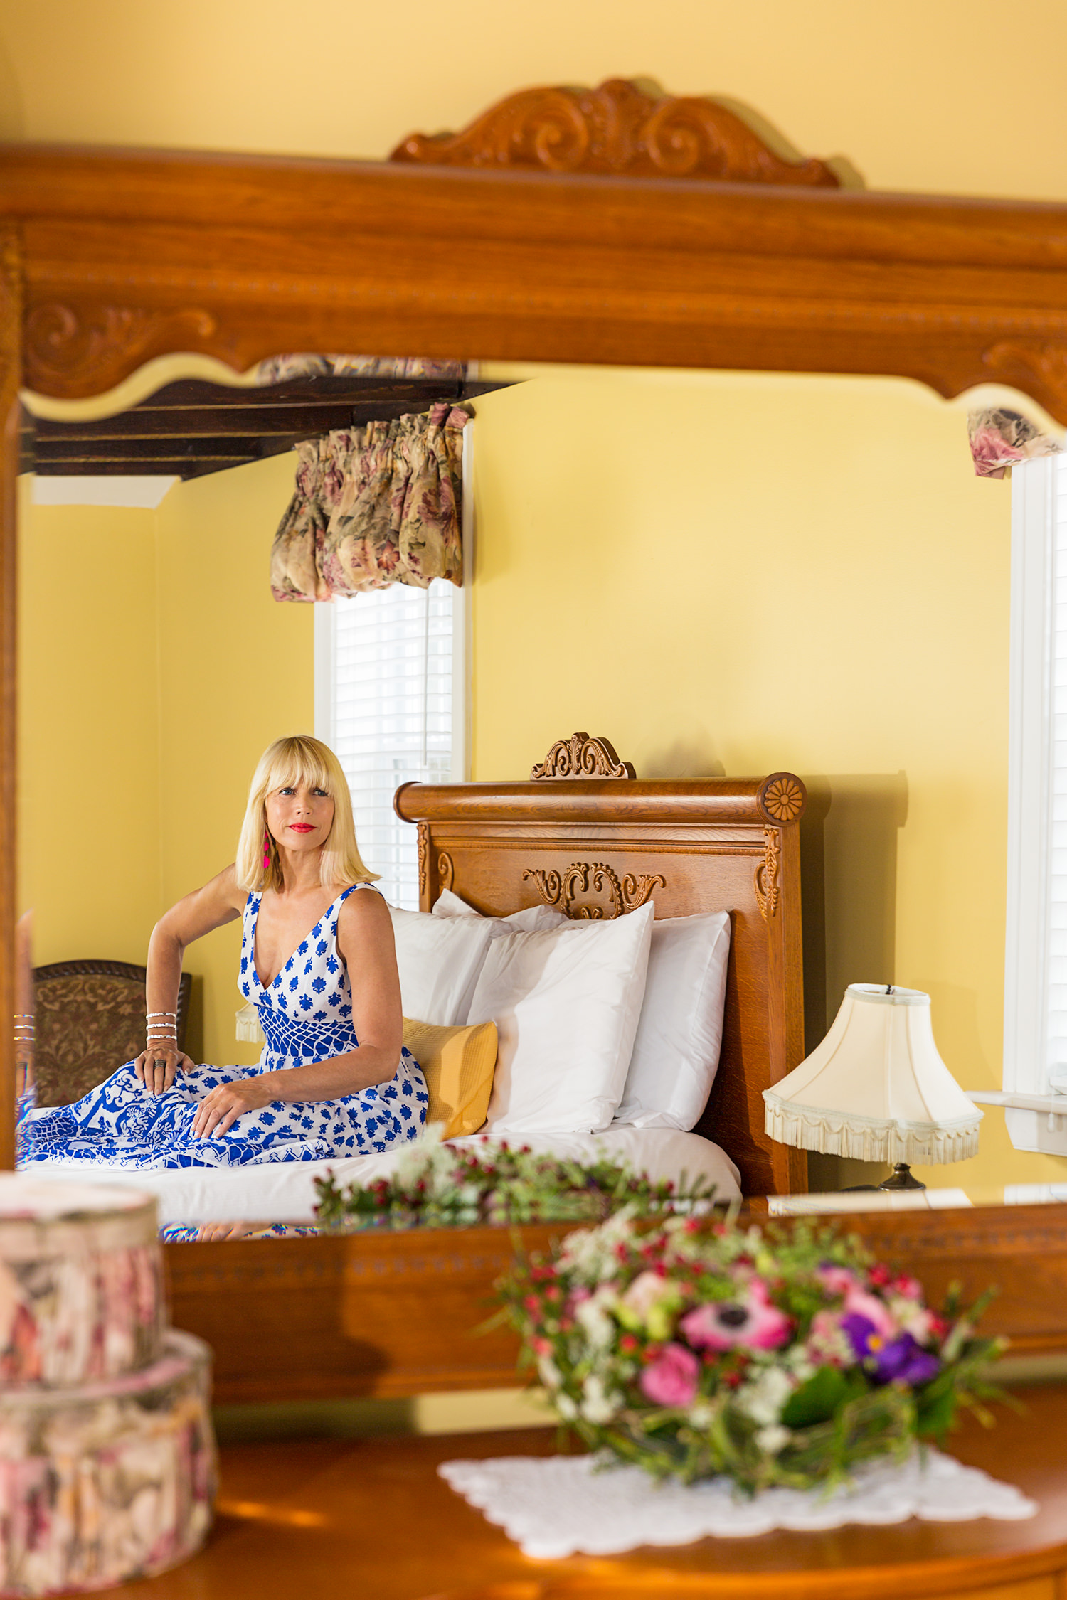 CatherineGraceO Essex Street Inn in Room Mirror